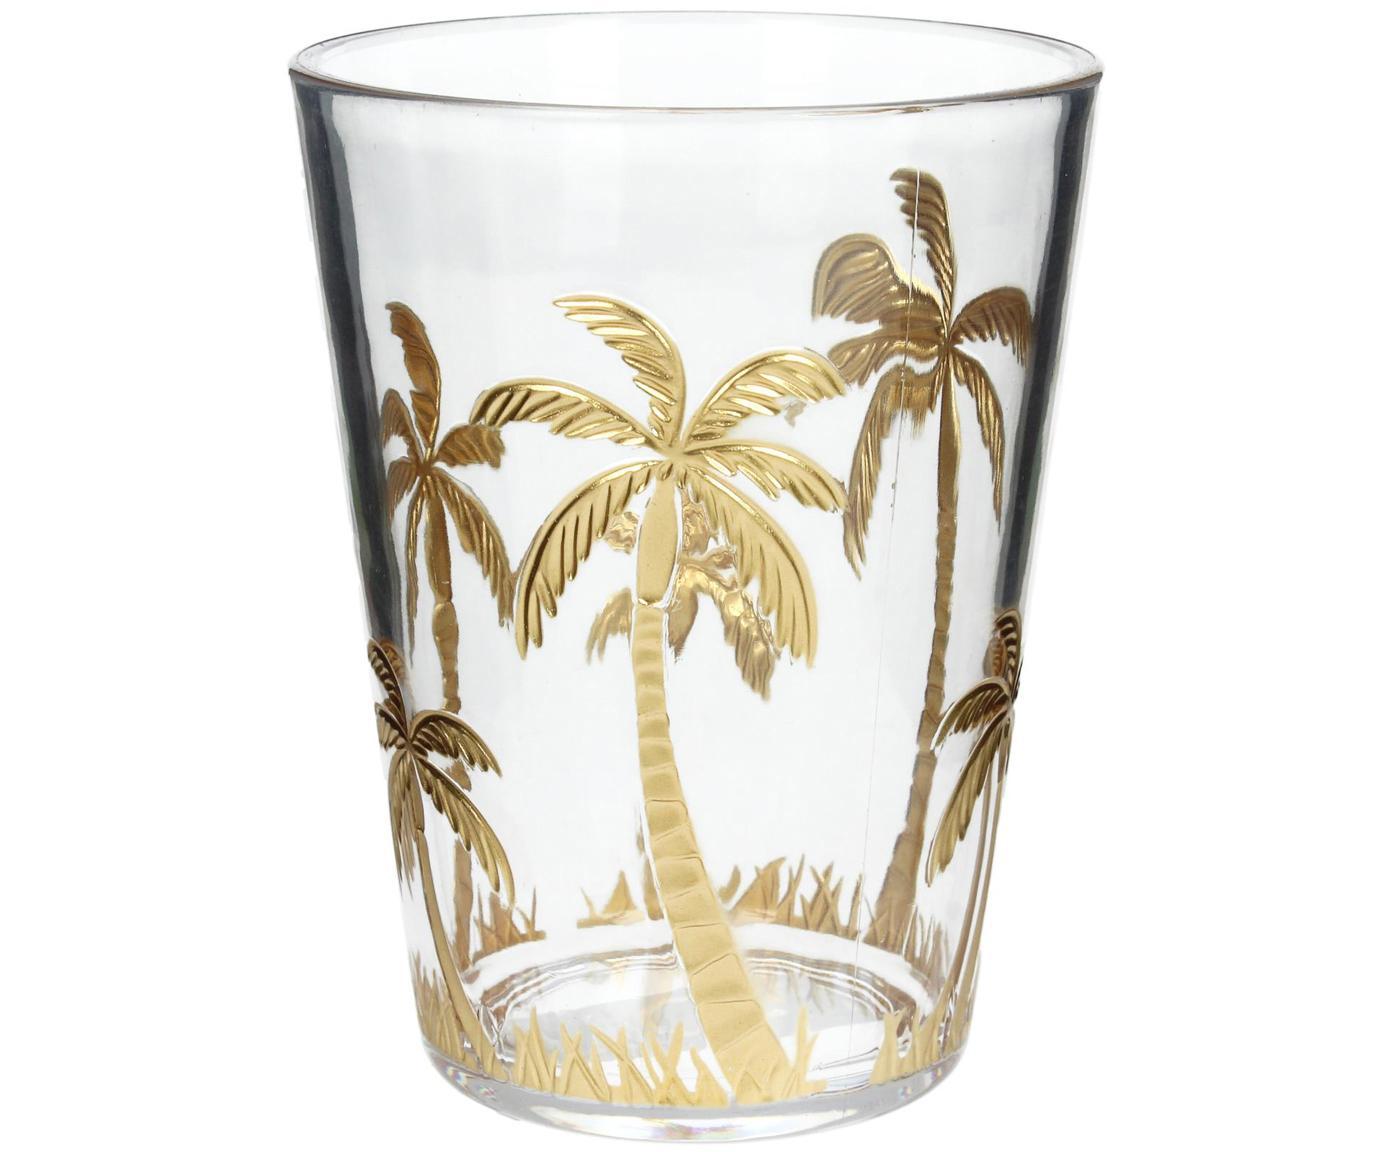 Acryl-Wasserglas Kimberly, Acryl, Transparent, Goldfarben, Ø 9 x H 12 cm